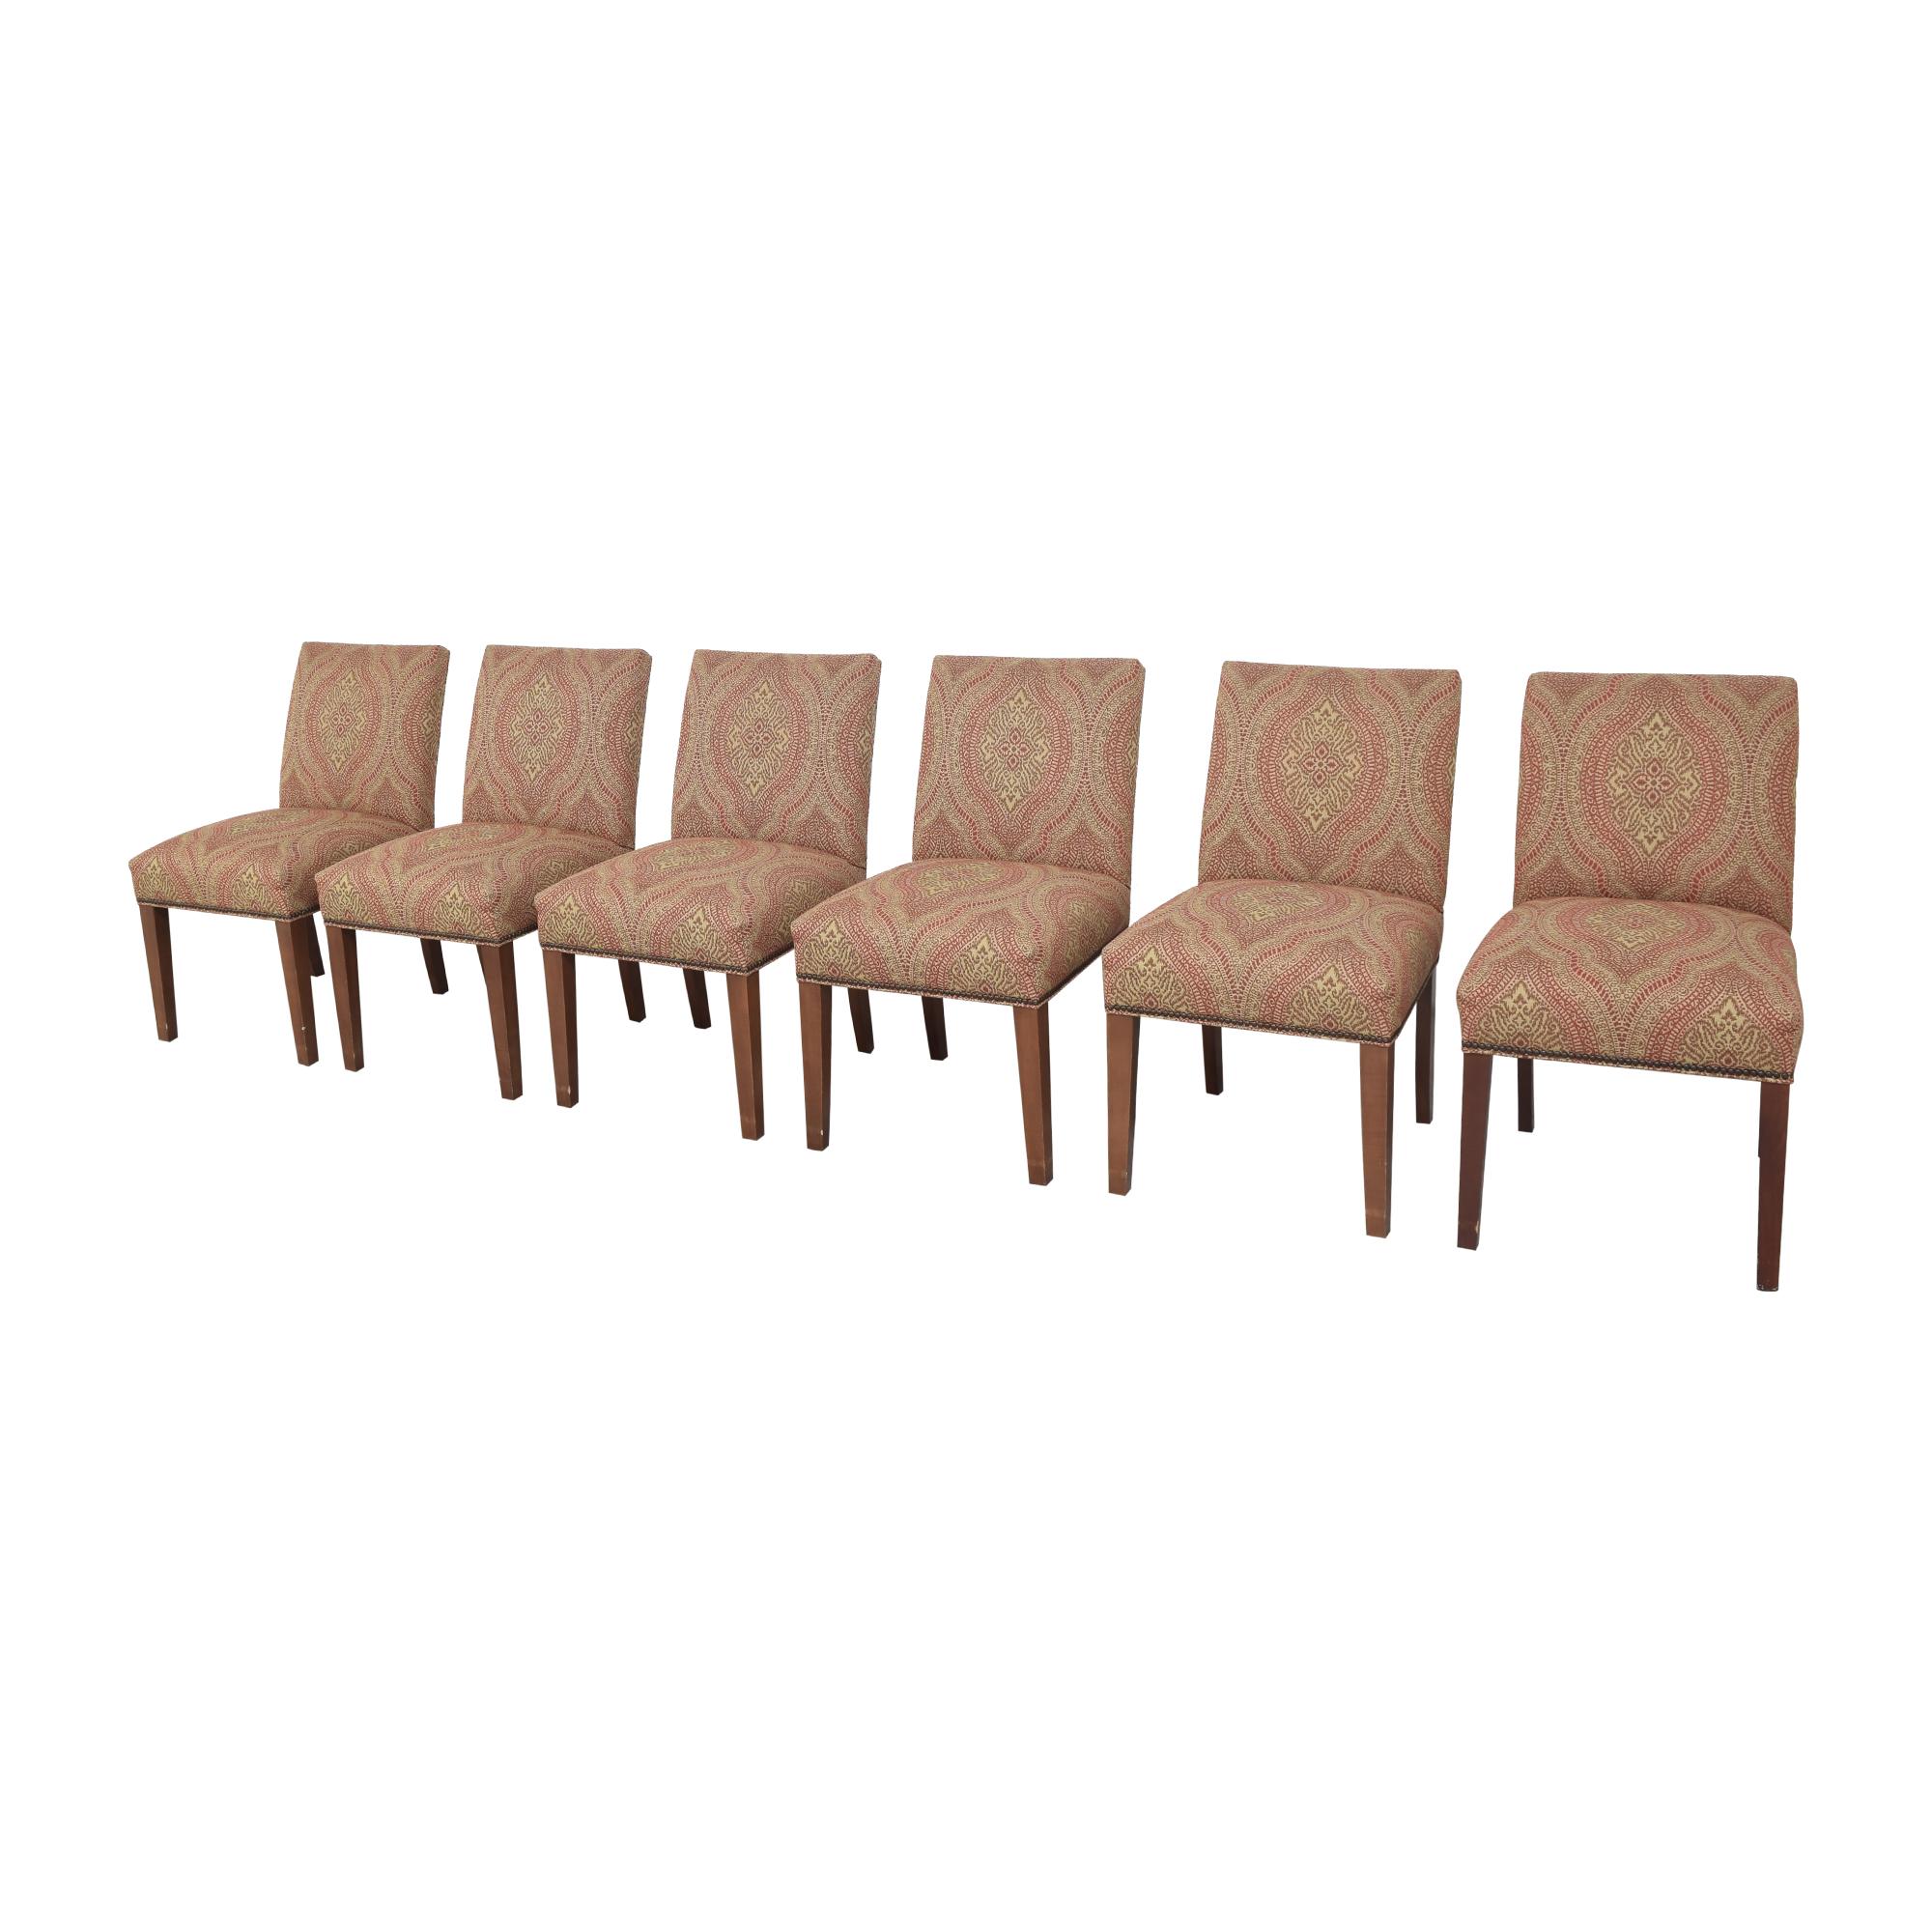 Ethan Allen Ethan Allen Sebago Dining Chairs on sale